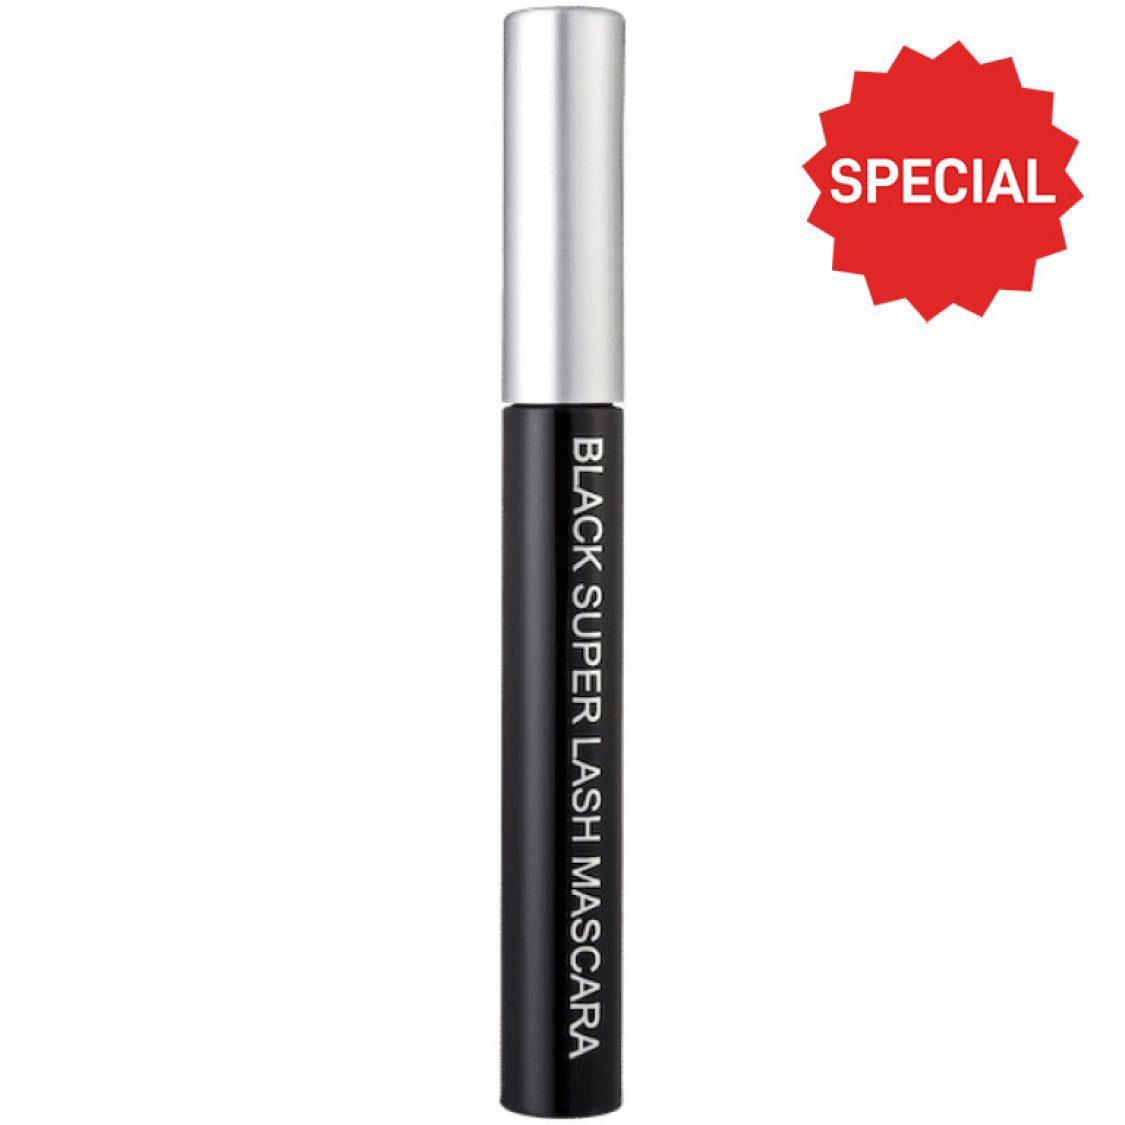 Hannon - Super Lash Mascara Long Last - Black